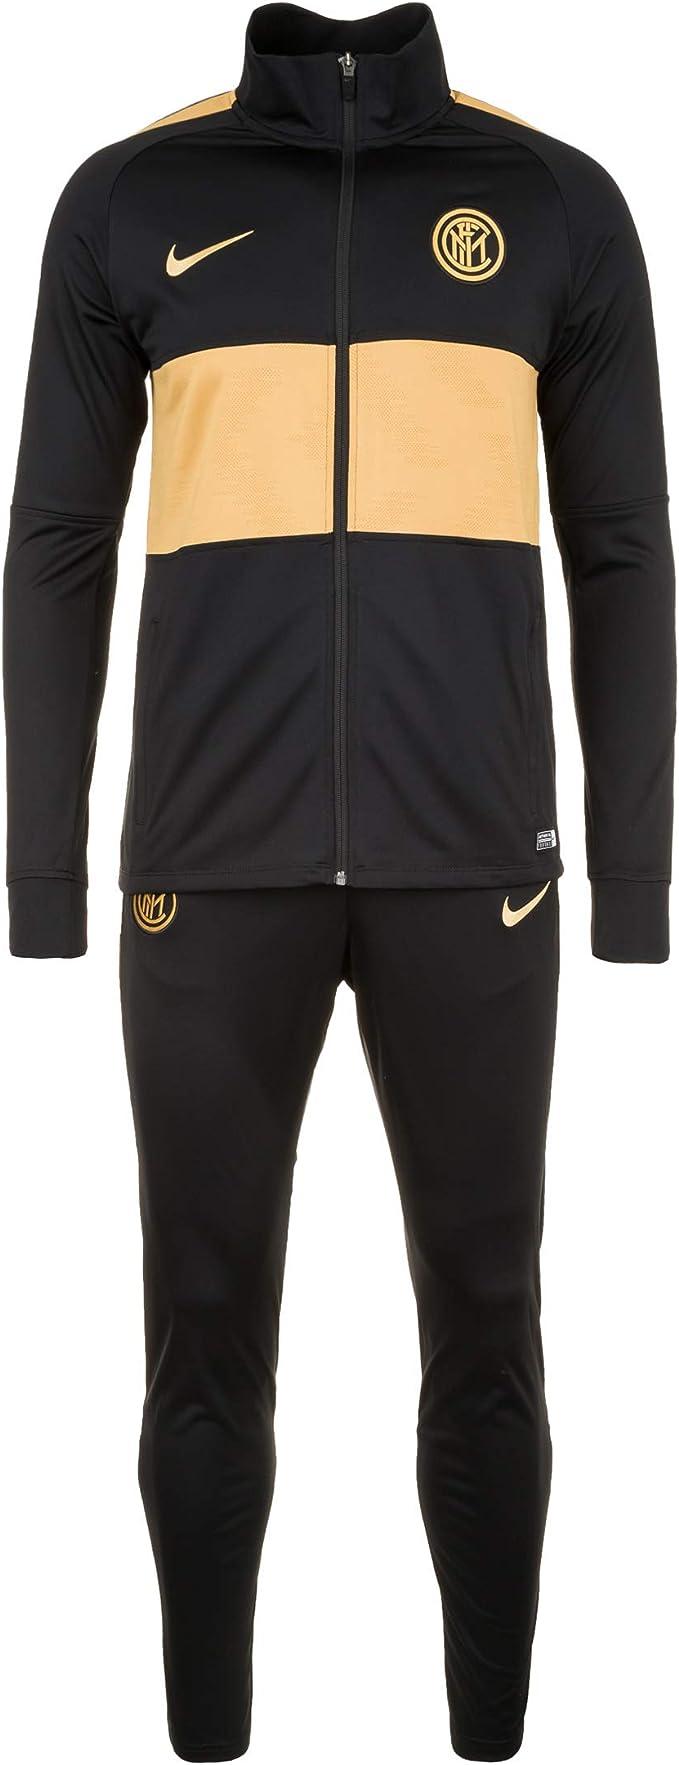 Nike Inter M Nk Dry Strk TRK Suit K Chándal, Hombre, Black/Black ...